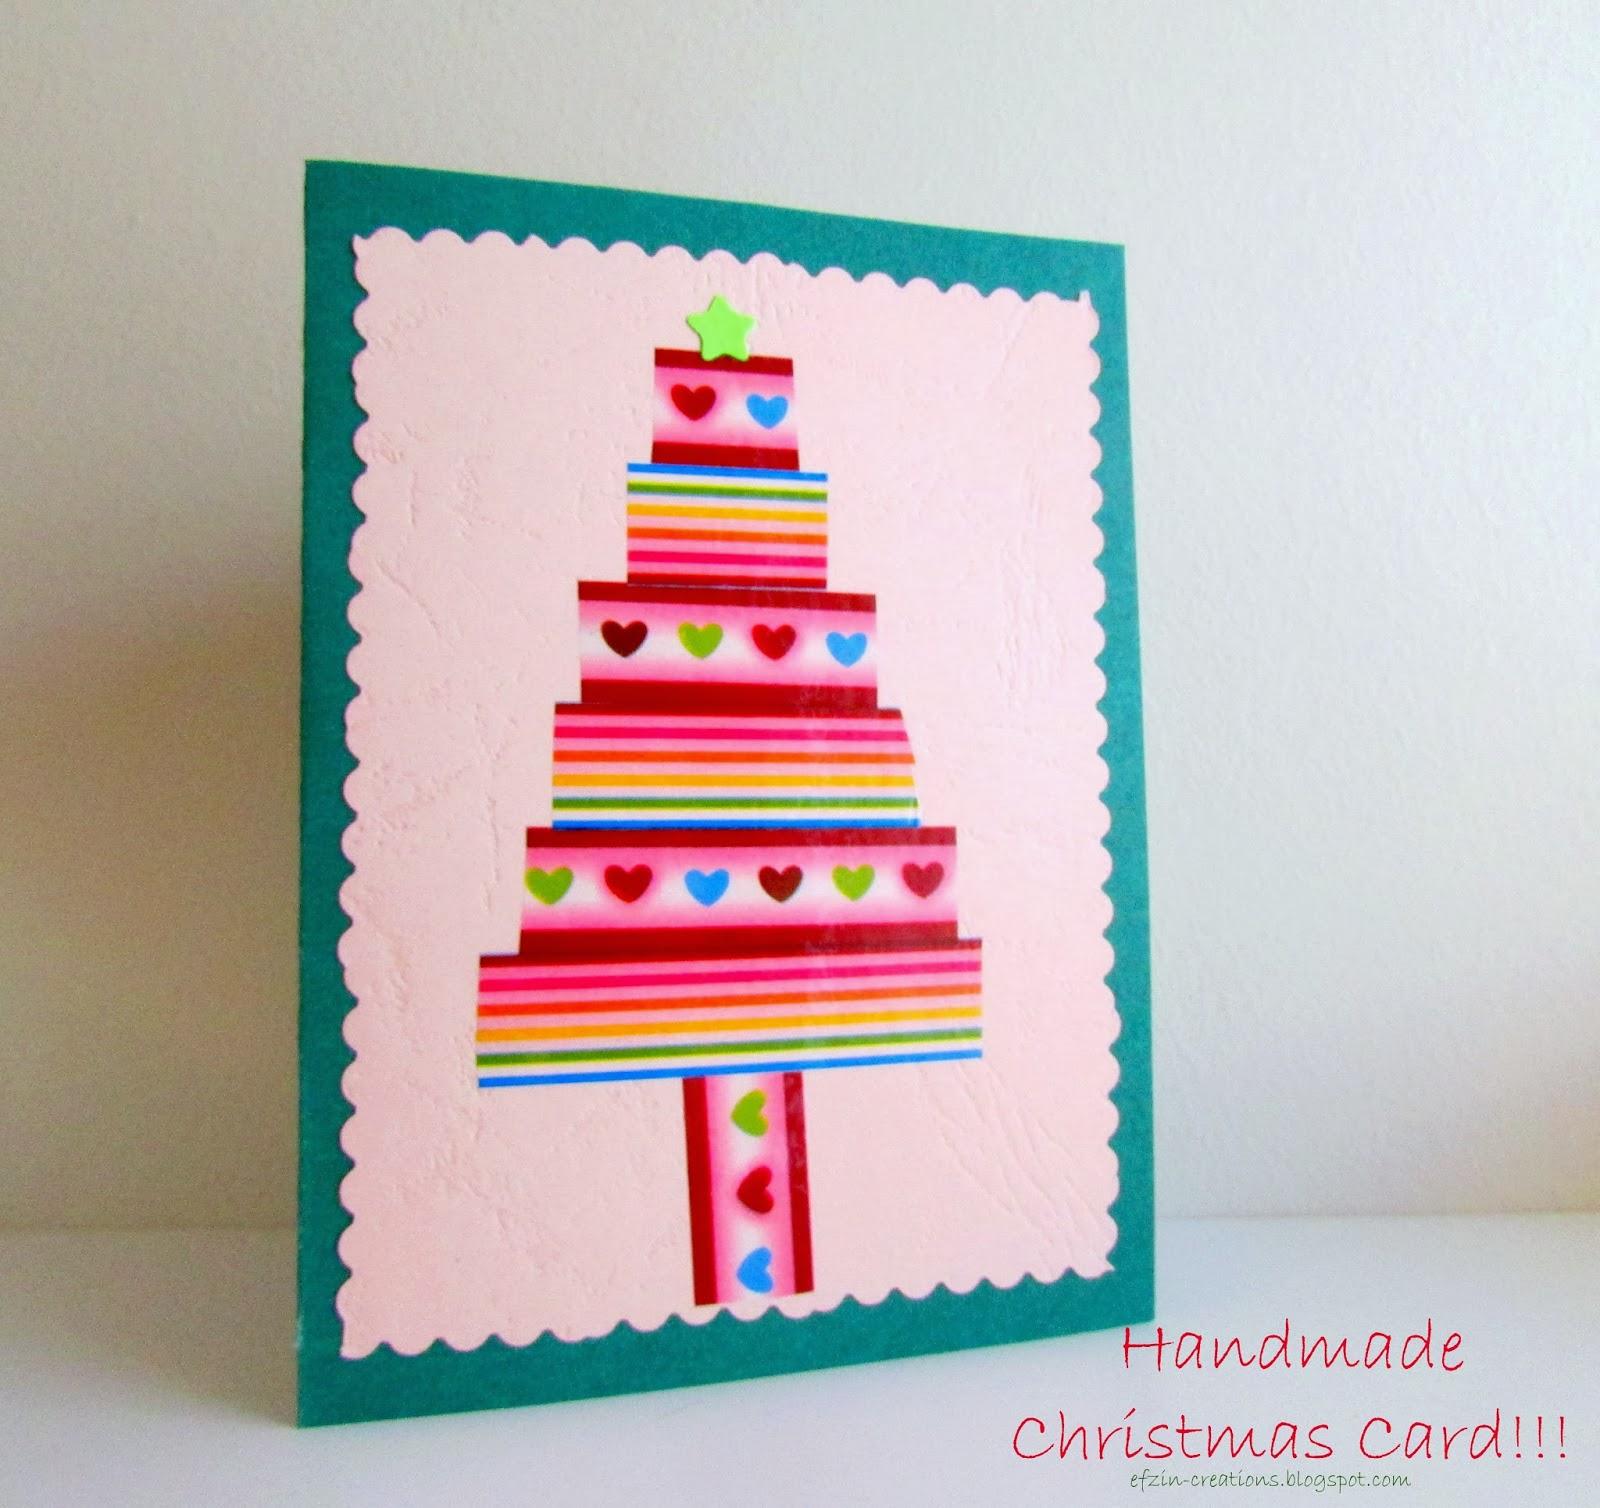 Christmas Wishing Card Ef Zin Creations